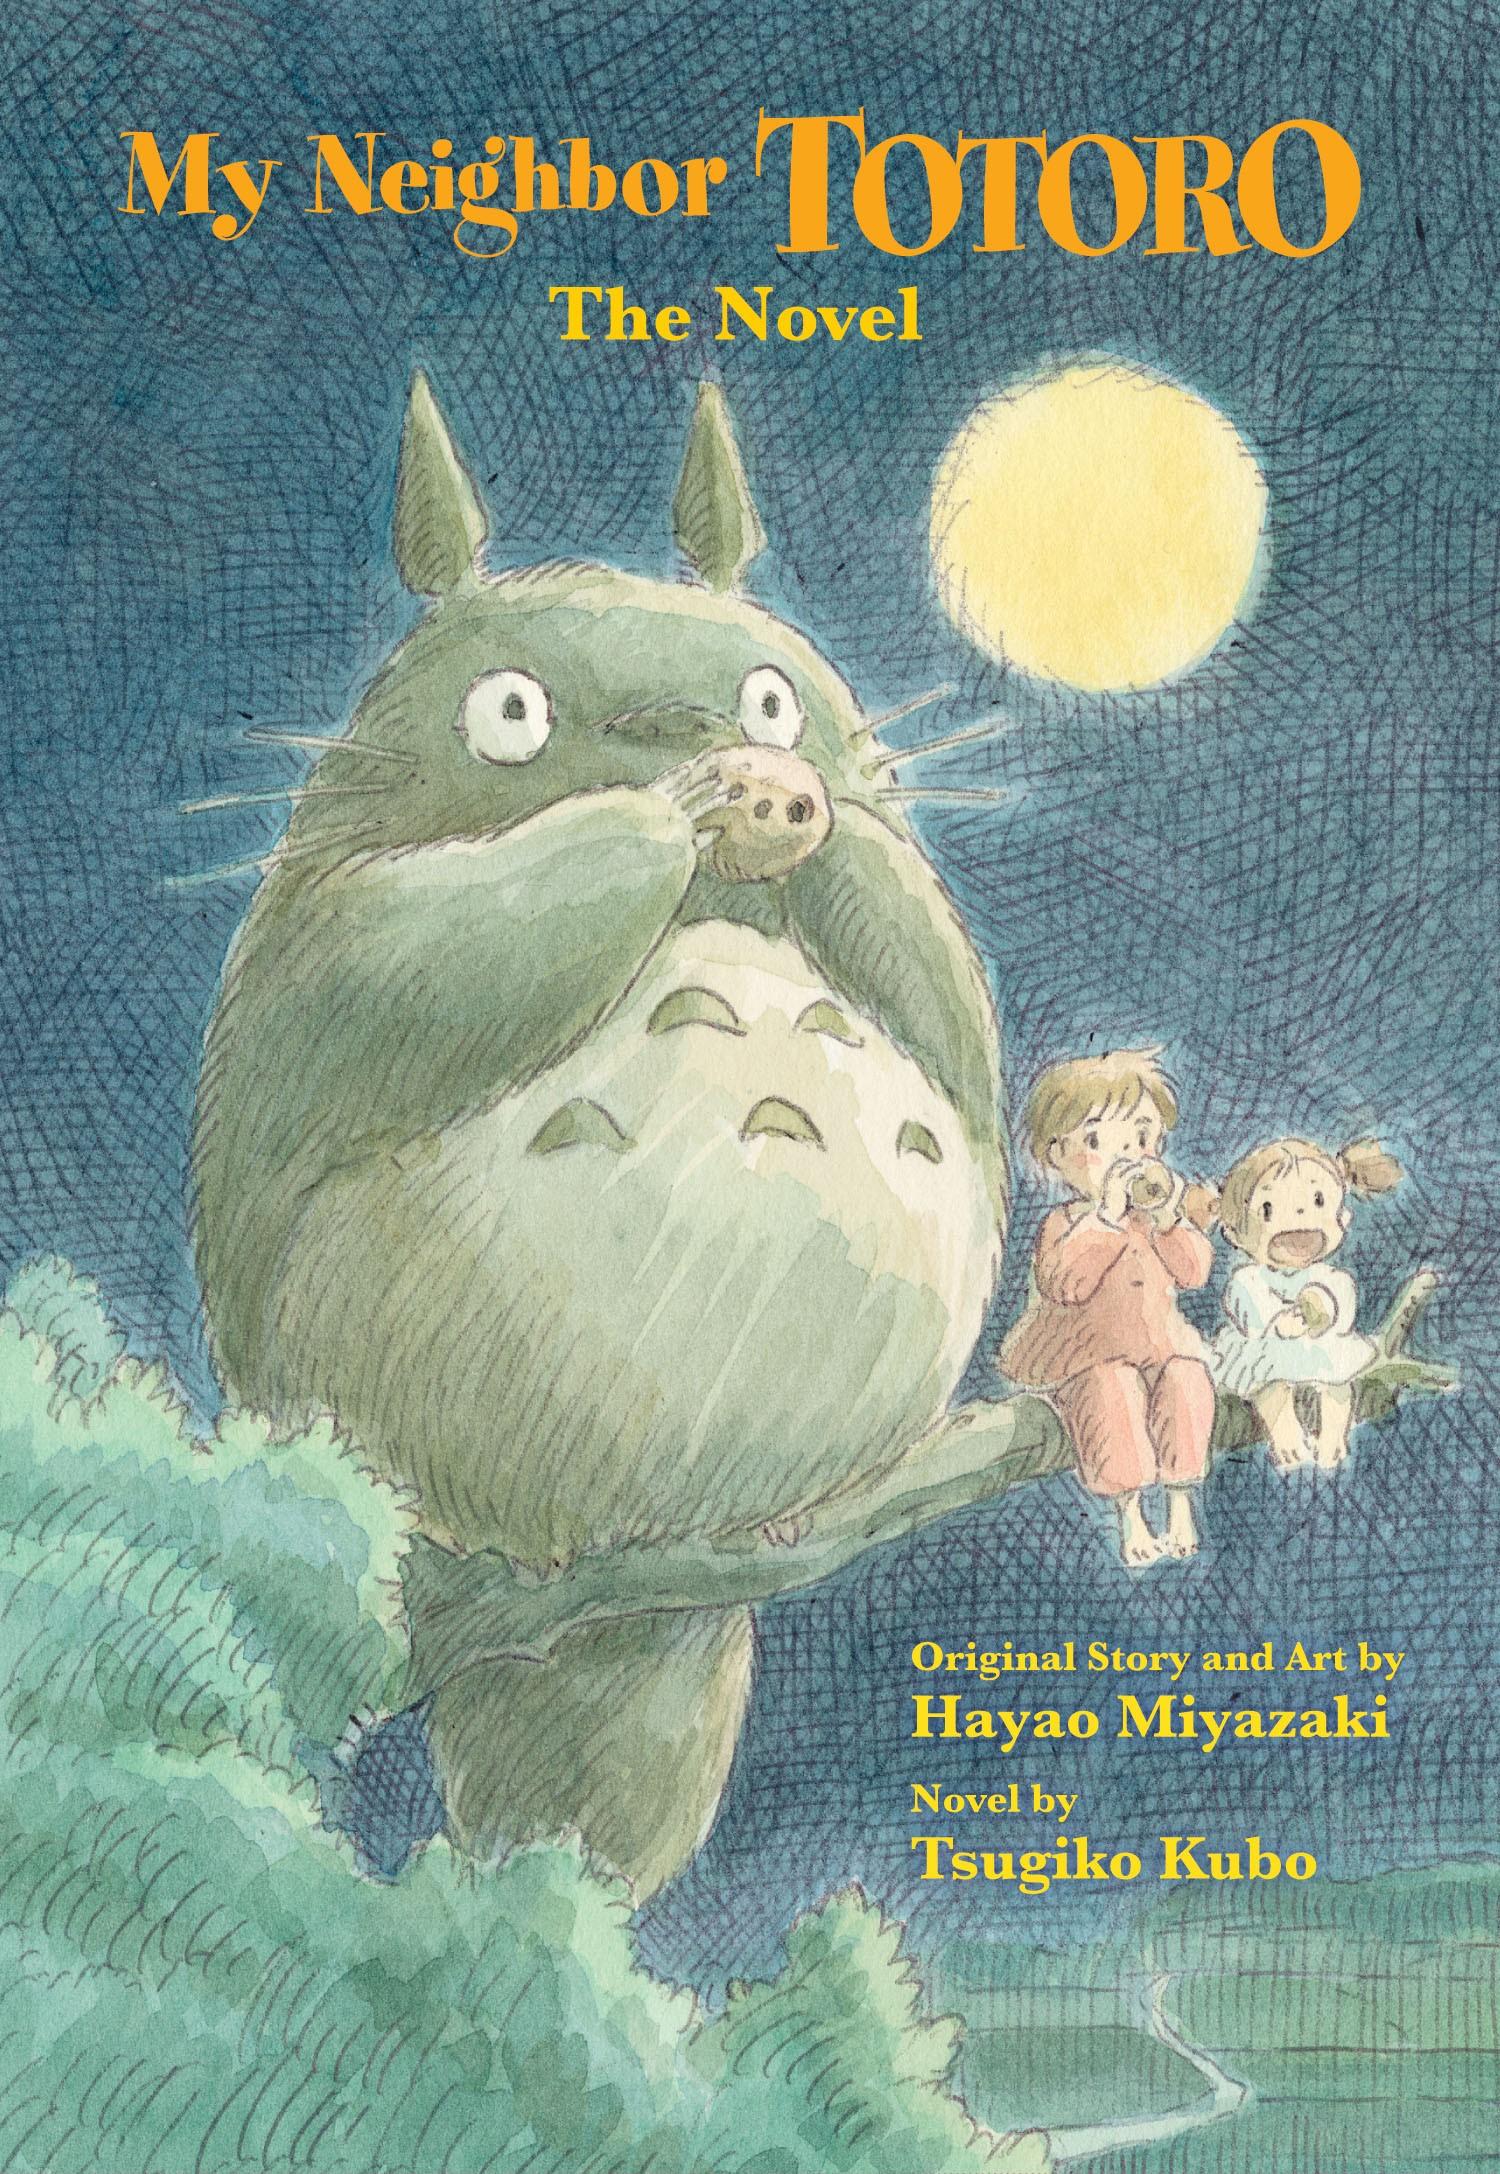 My Neighbor Totoro (Novel)